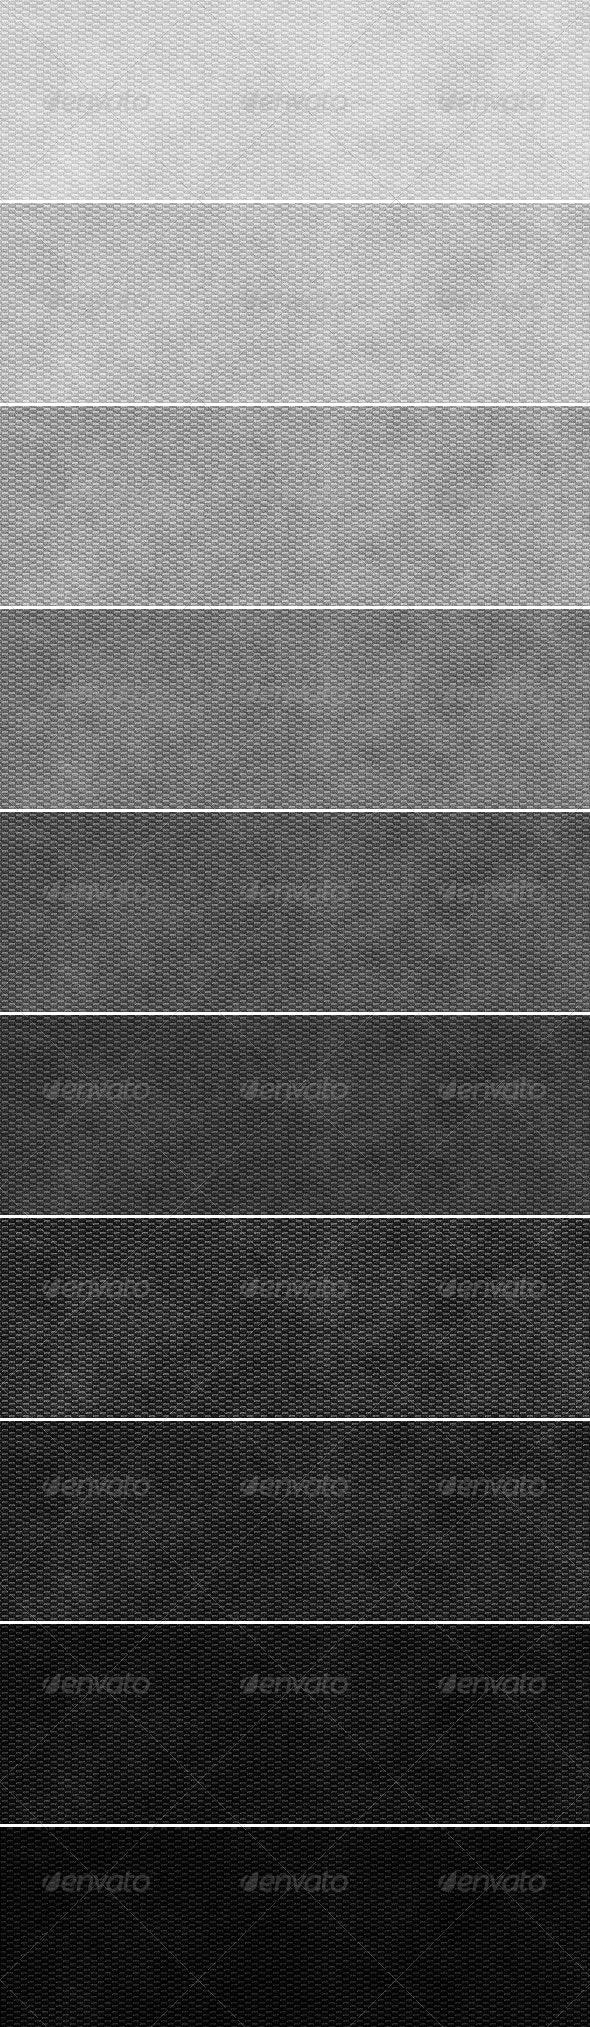 Fabric Background 1 - Urban Backgrounds